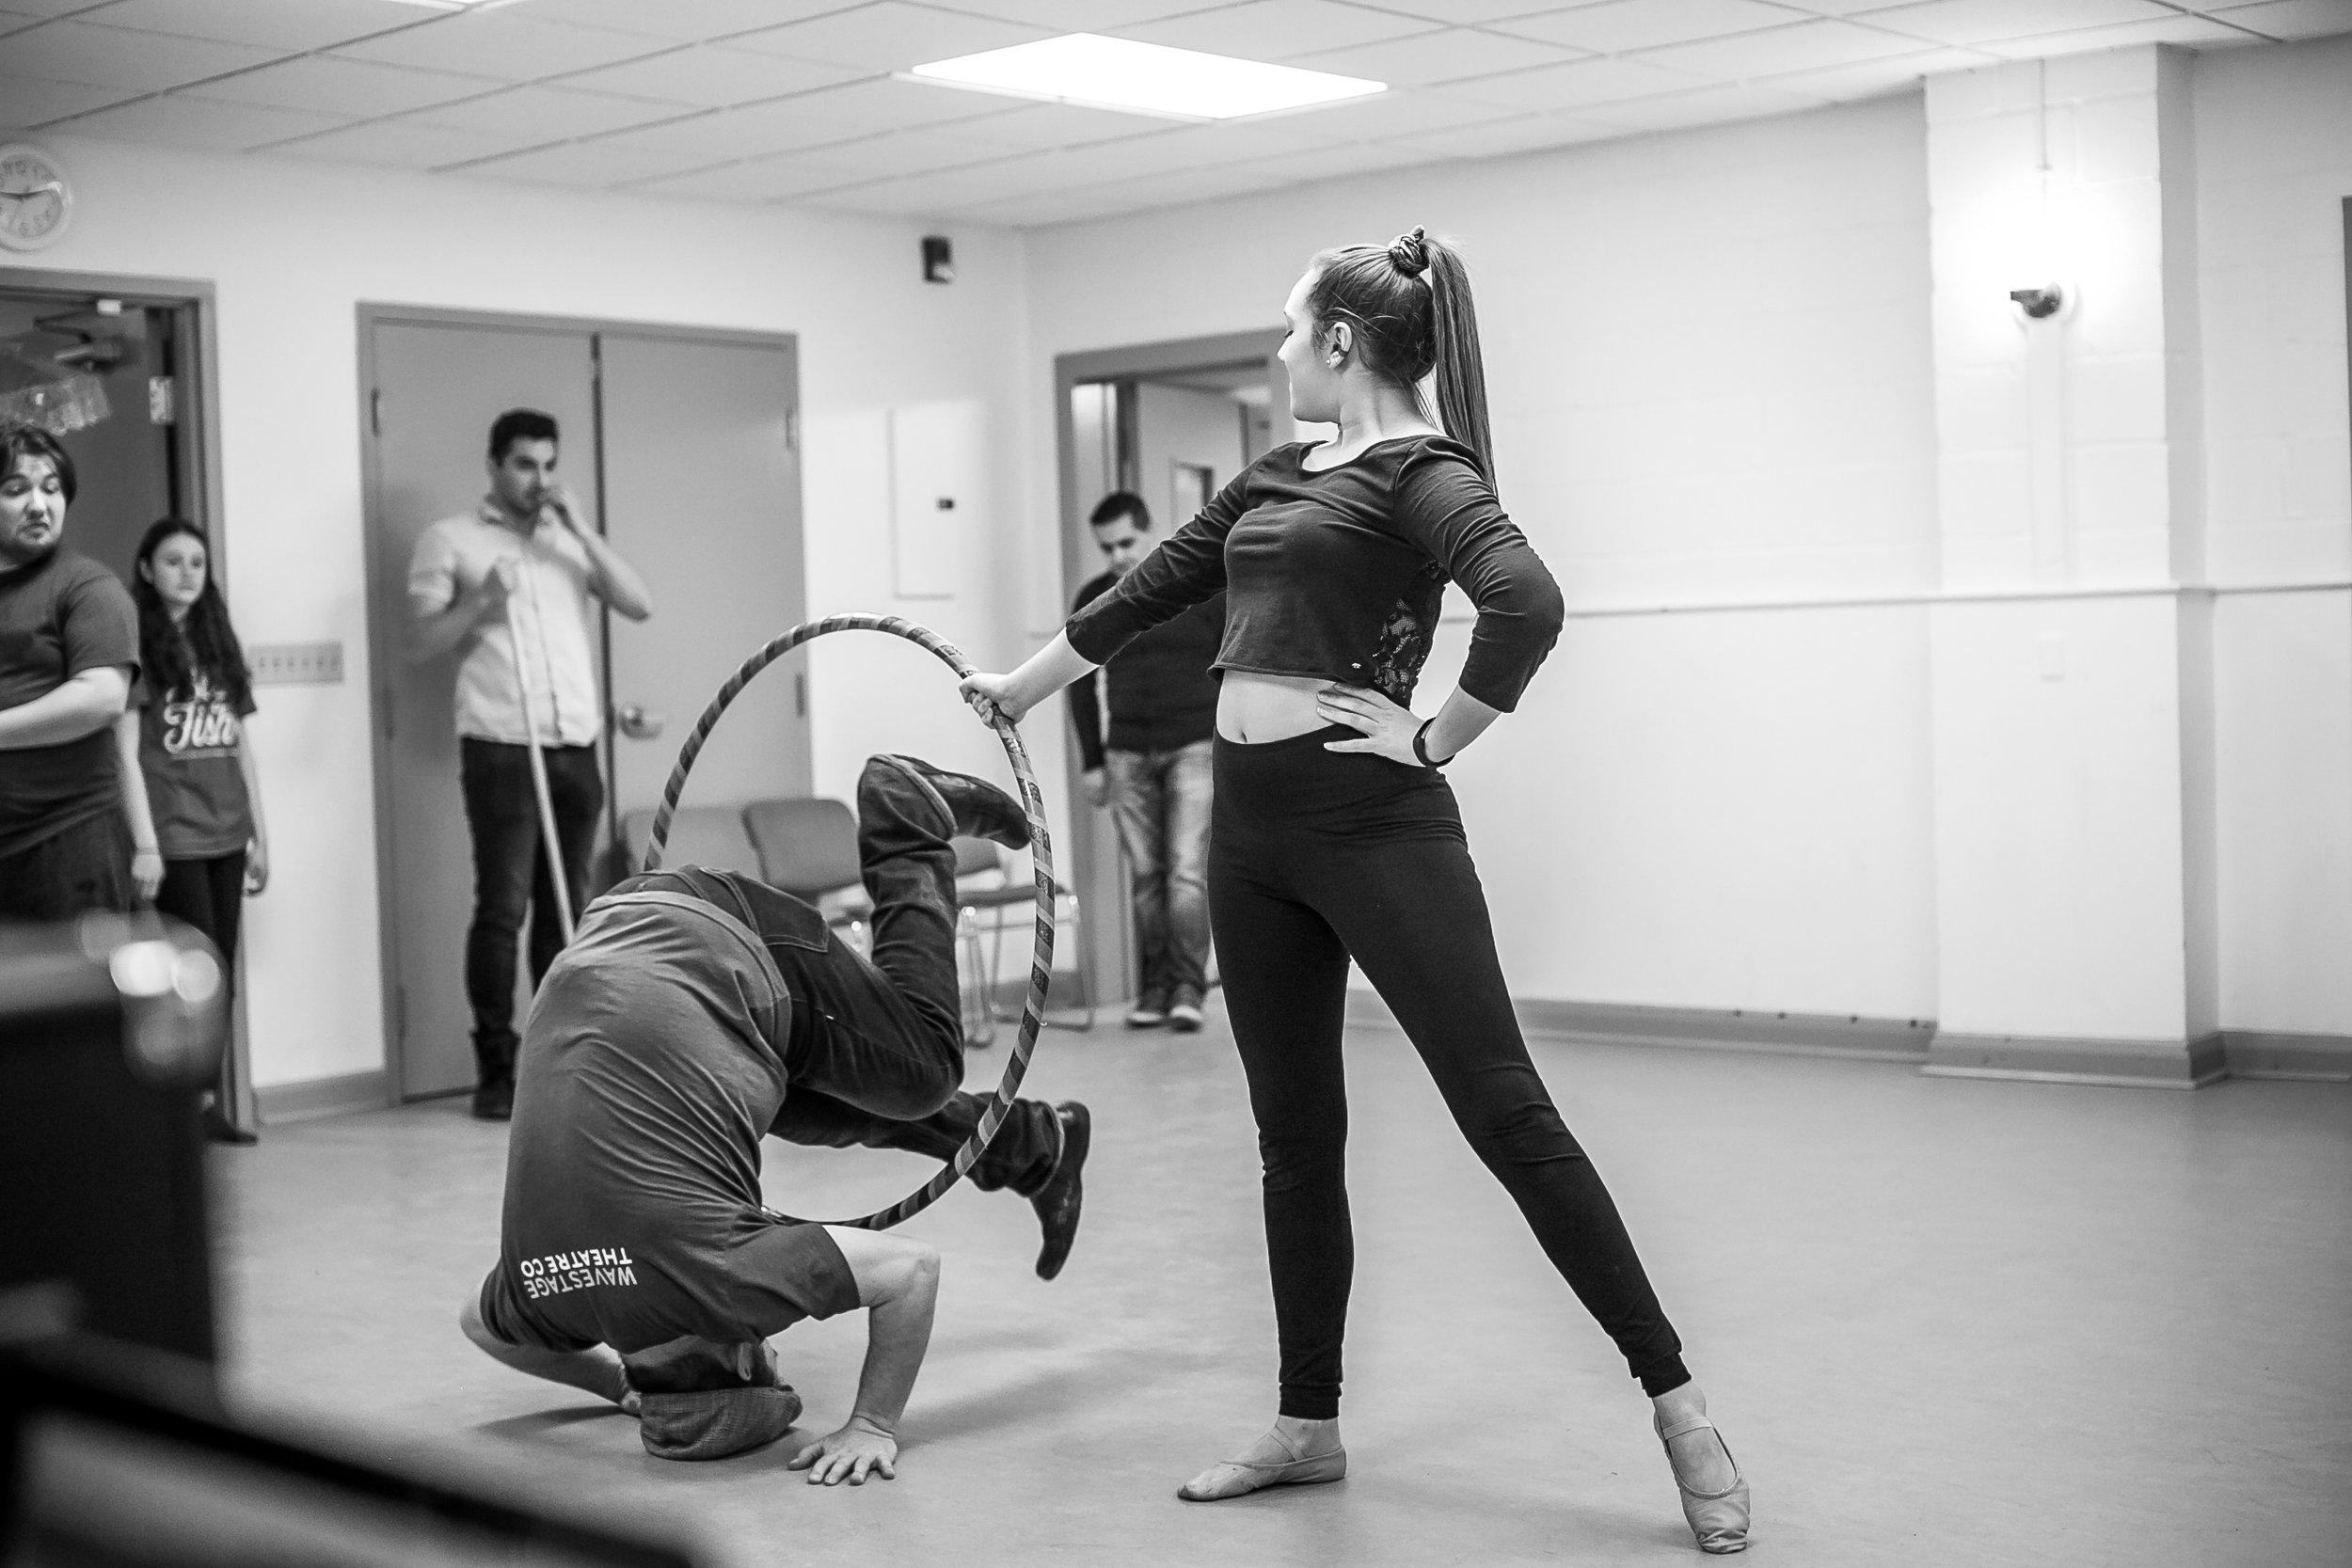 newmarket-toronto-theatre-rehearsal-musical-36.jpg